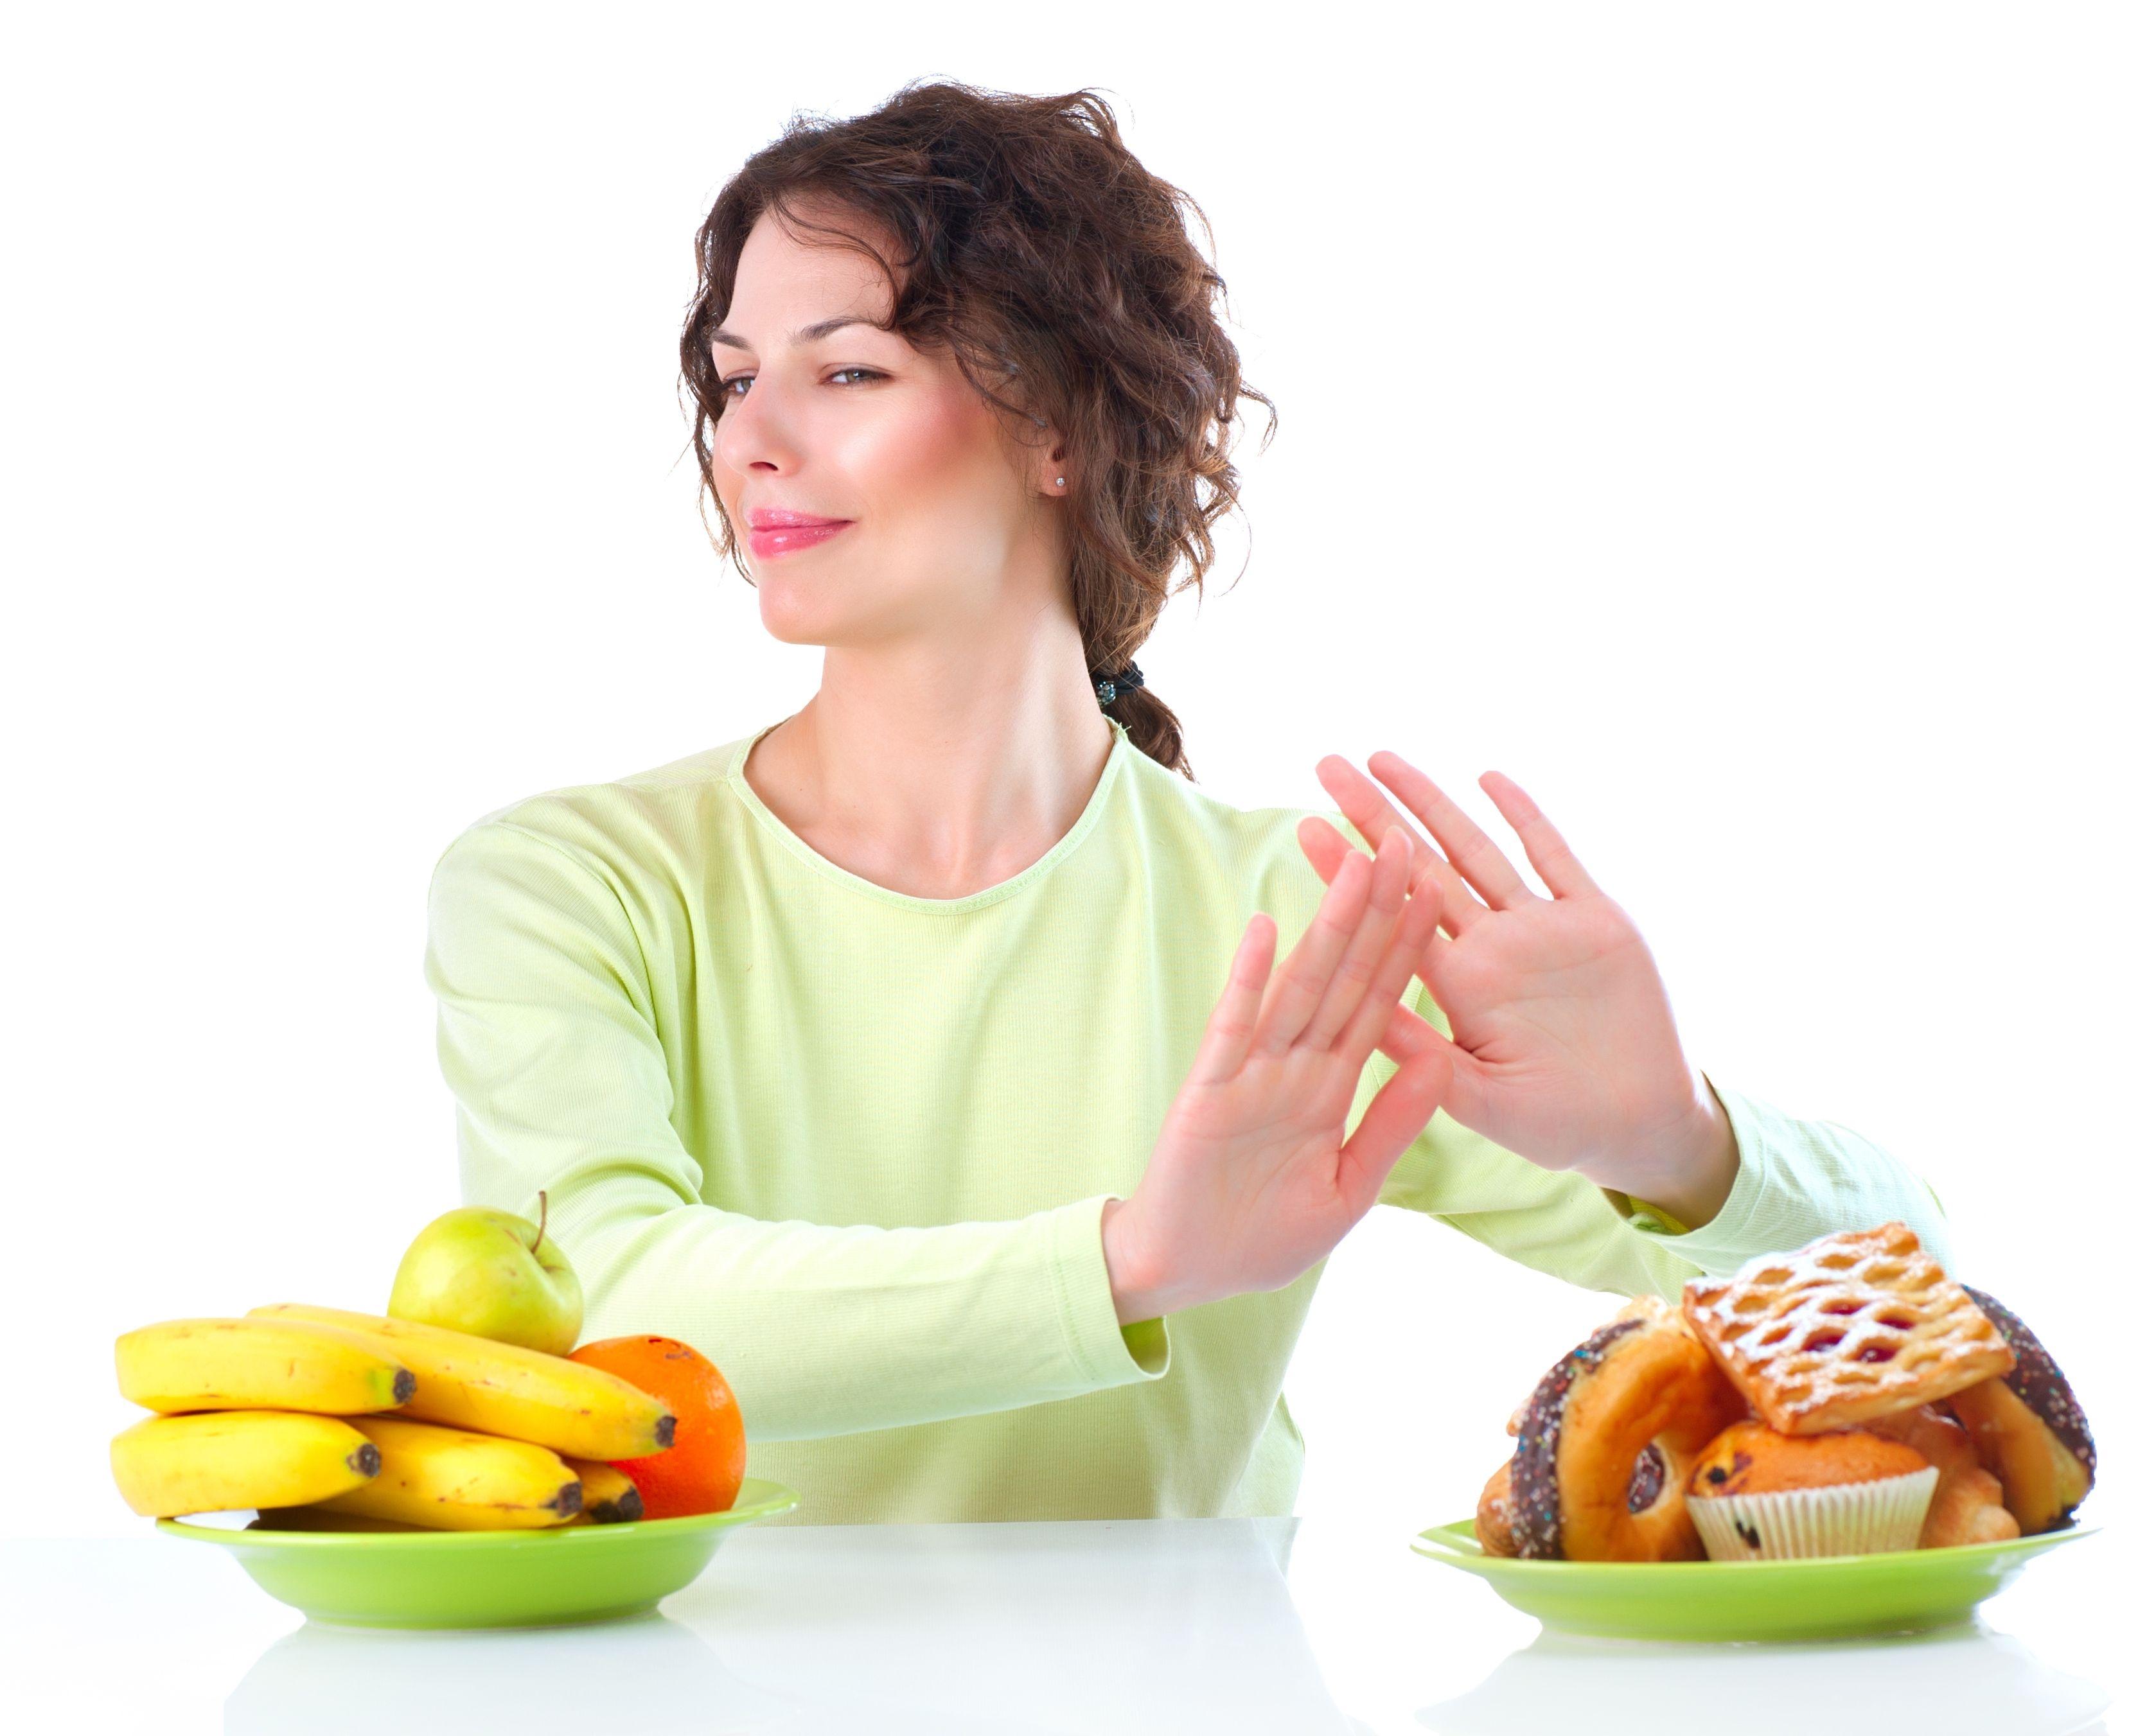 Cosa puoi mangiare a merenda senza appesantirti quando sei a dieta